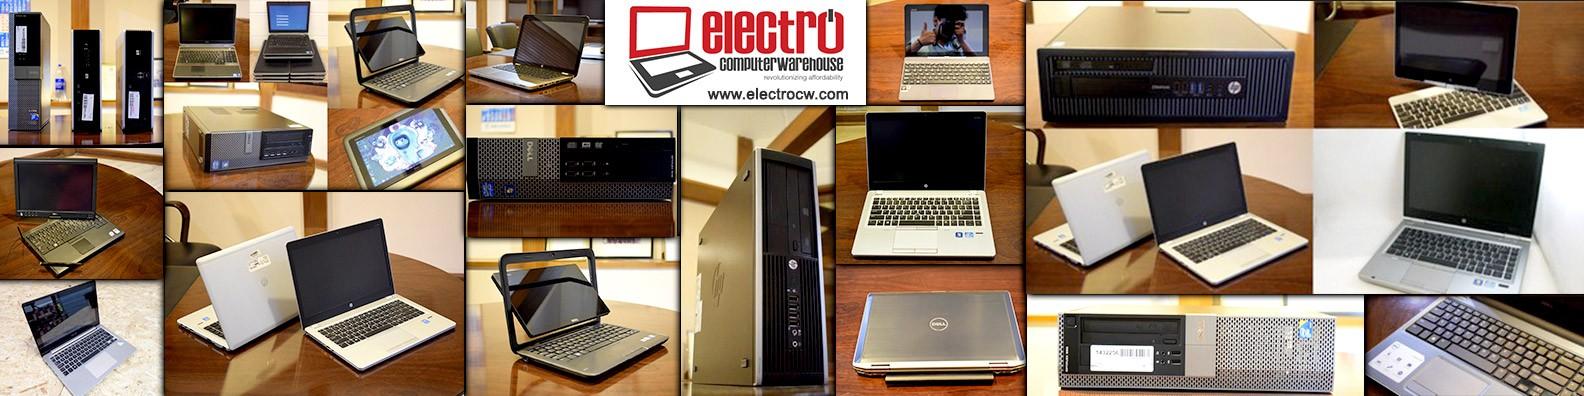 Electro Computer Warehouse - Electro Inc    LinkedIn